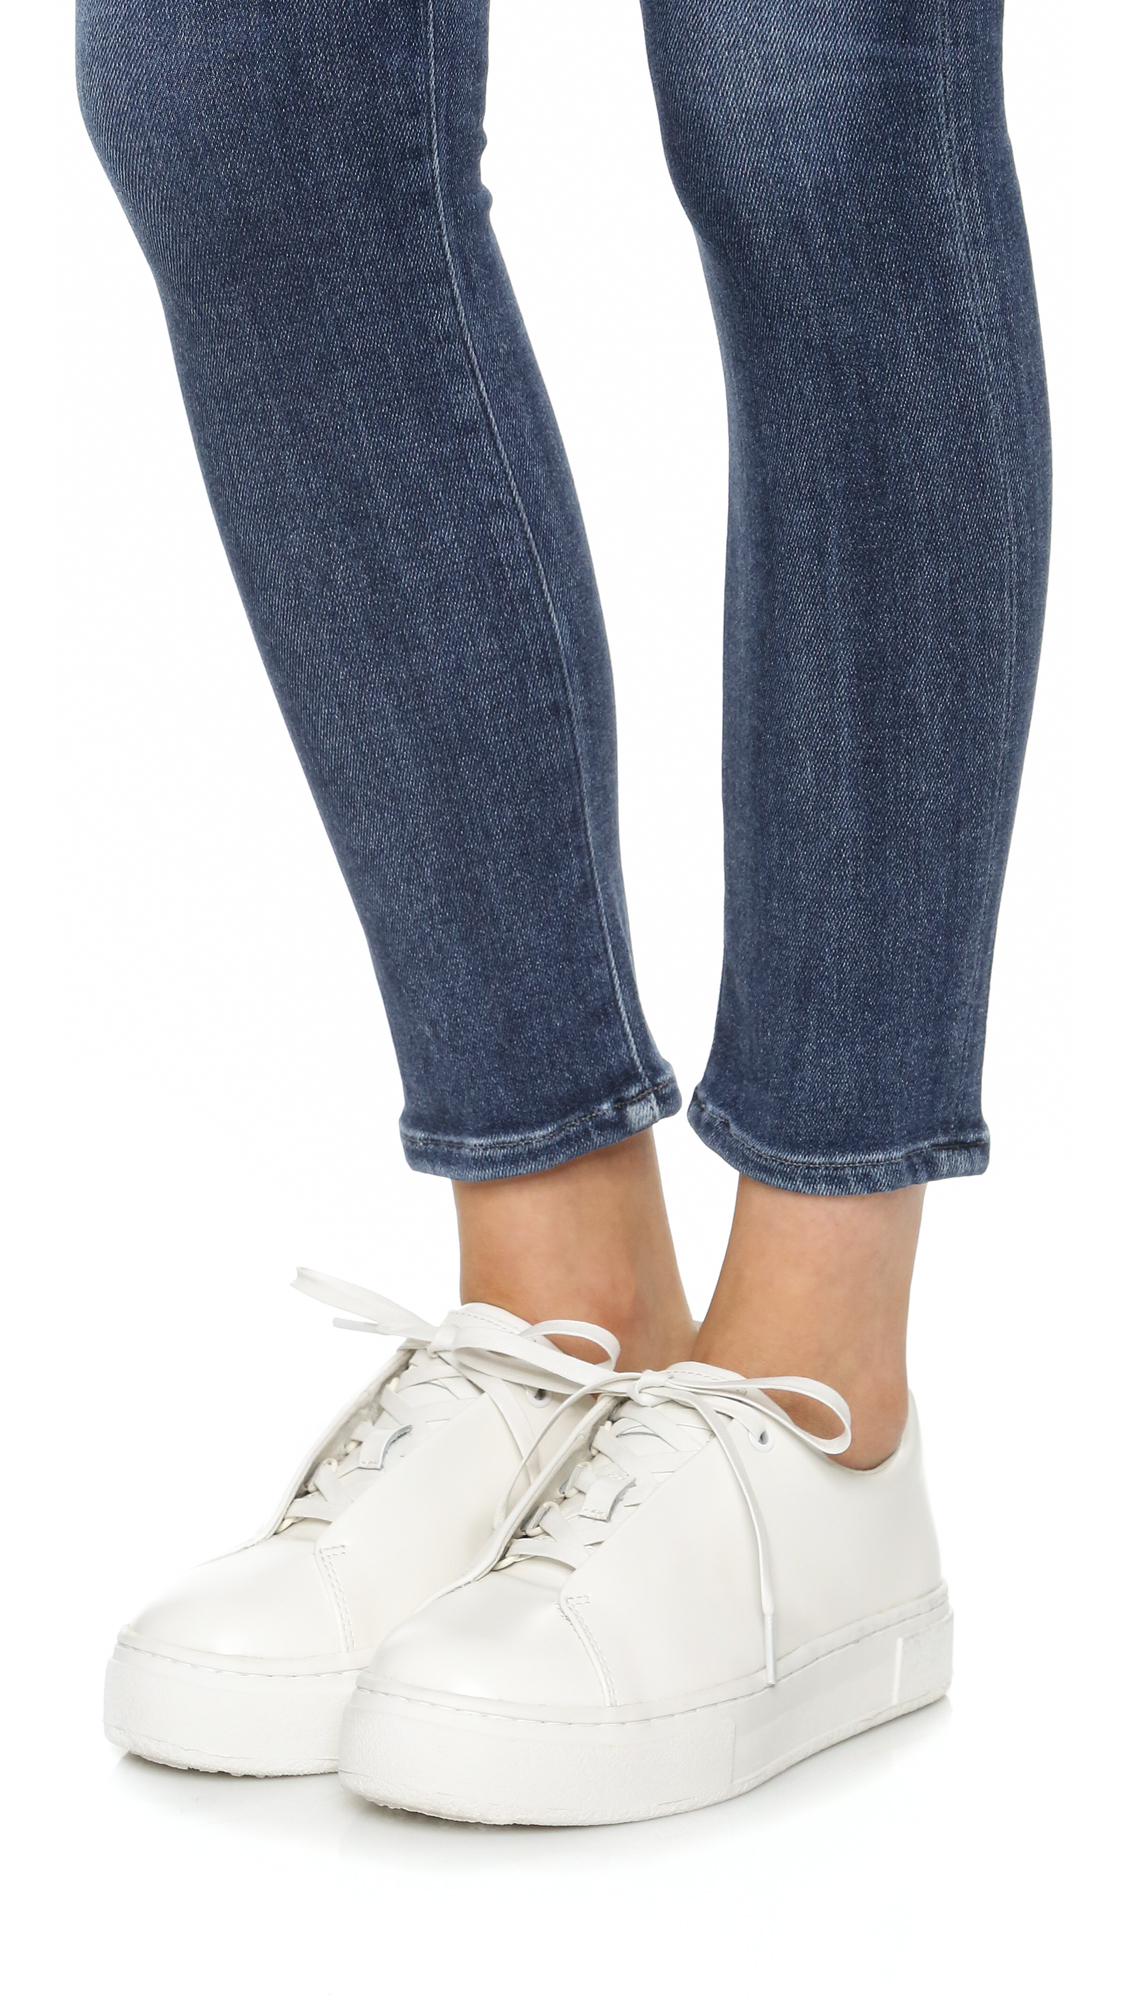 Eytys Doja Leather Sneakers in White - Lyst